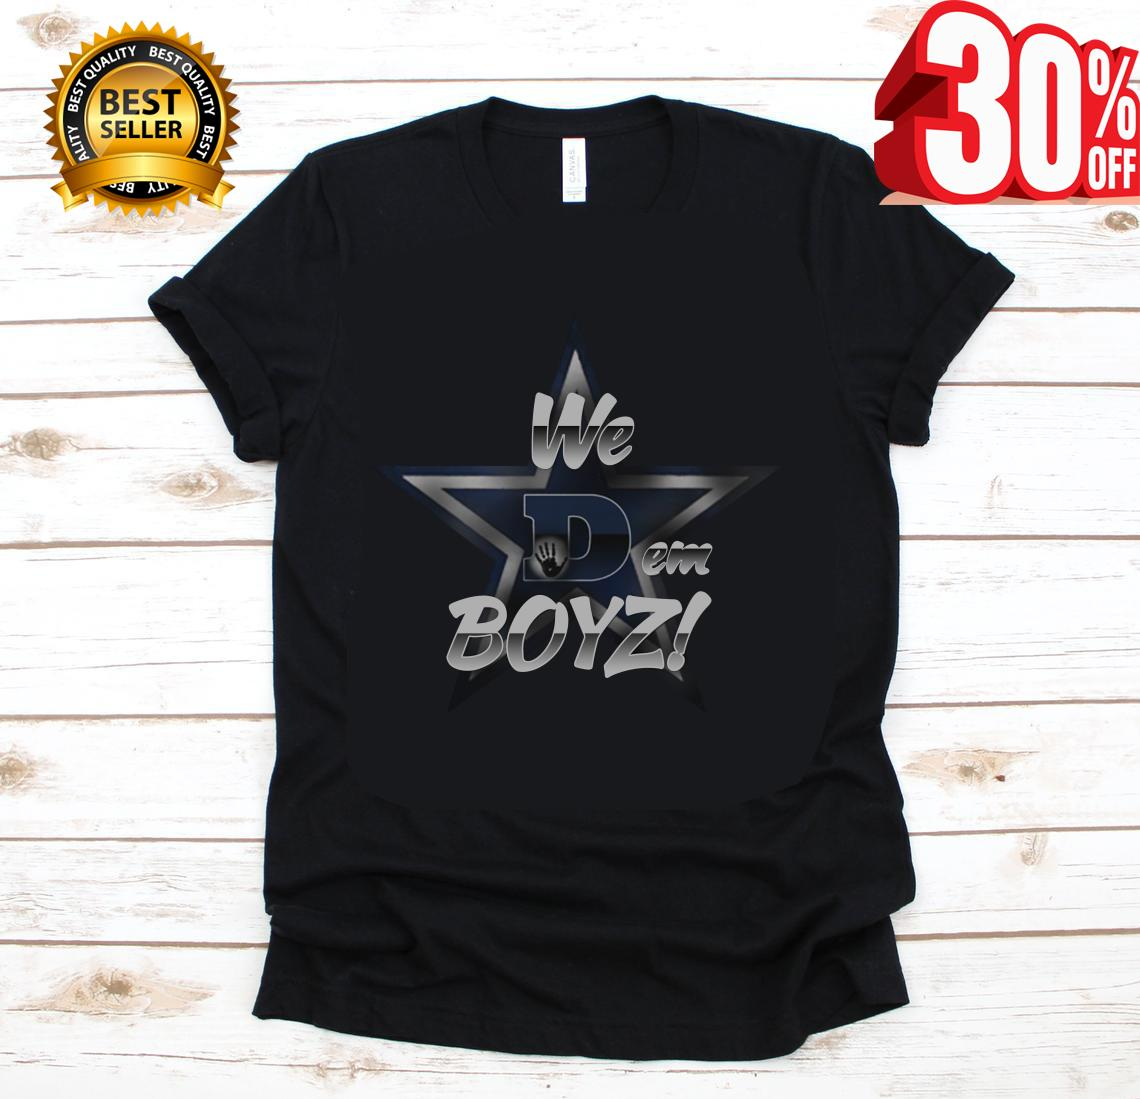 380f5f22c5e FAN MADE ] Dallas cowboys we dem boyz shirt, hoodie, tank top